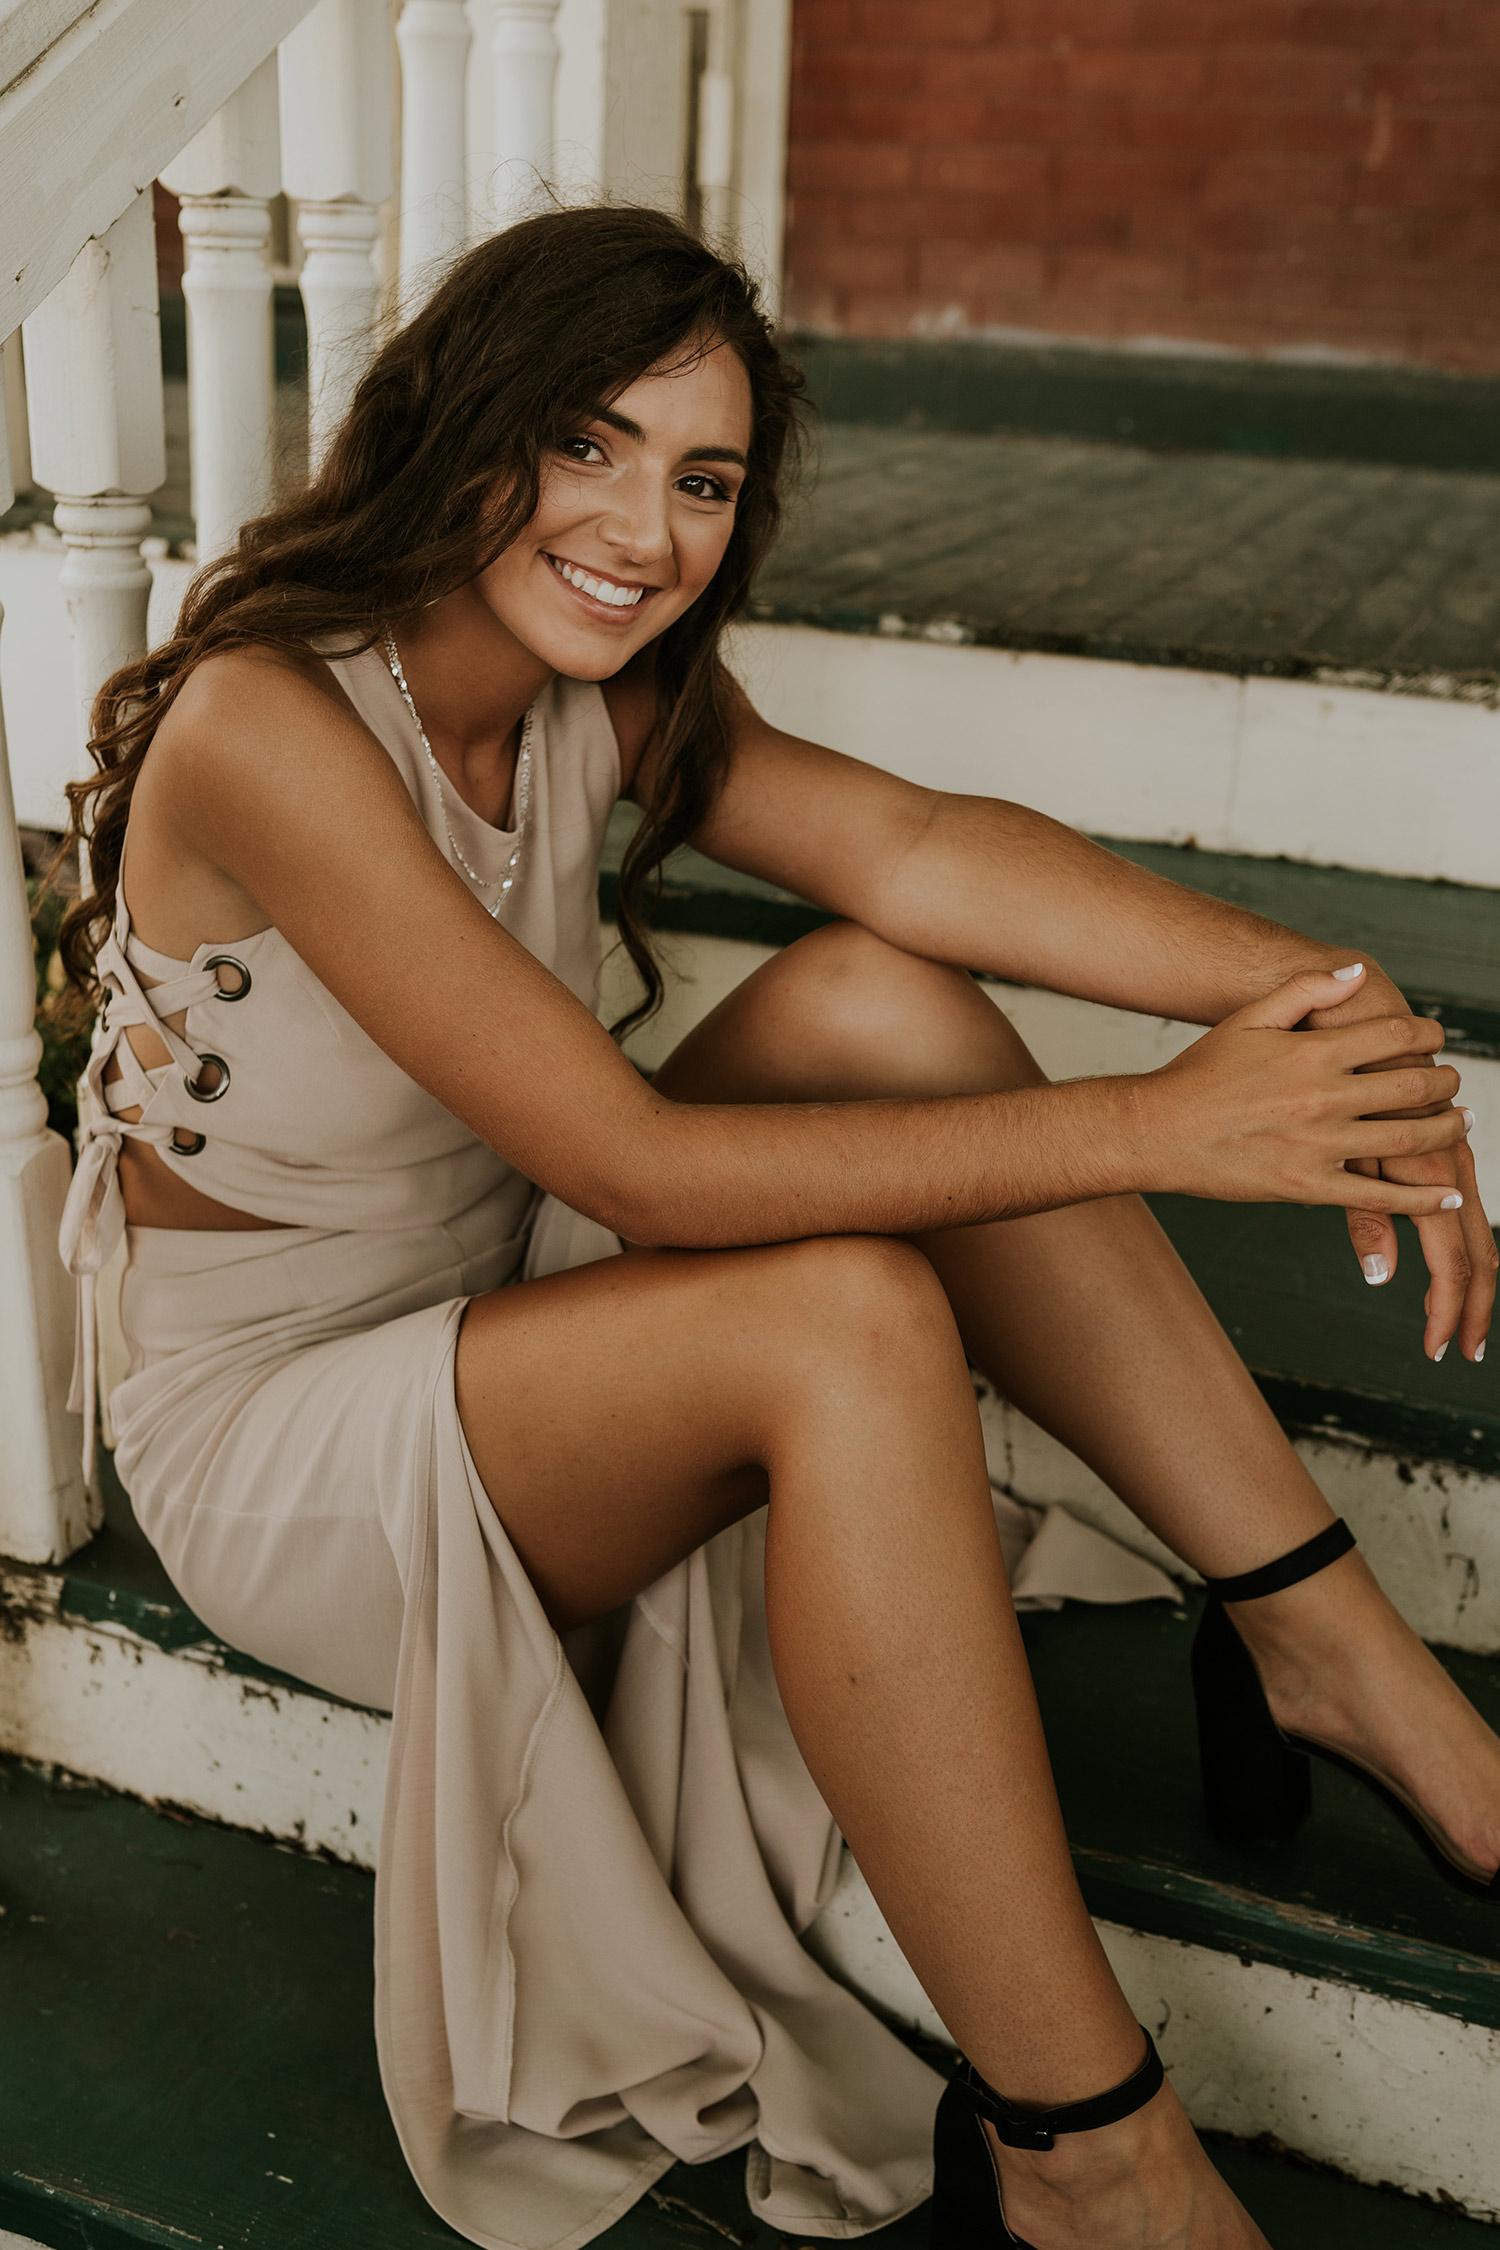 lizzy-senior-girl-sitting-on-porch-winterset-ankeny-high-school-desmoines-iowa-raelyn-ramey-photography-45.jpg